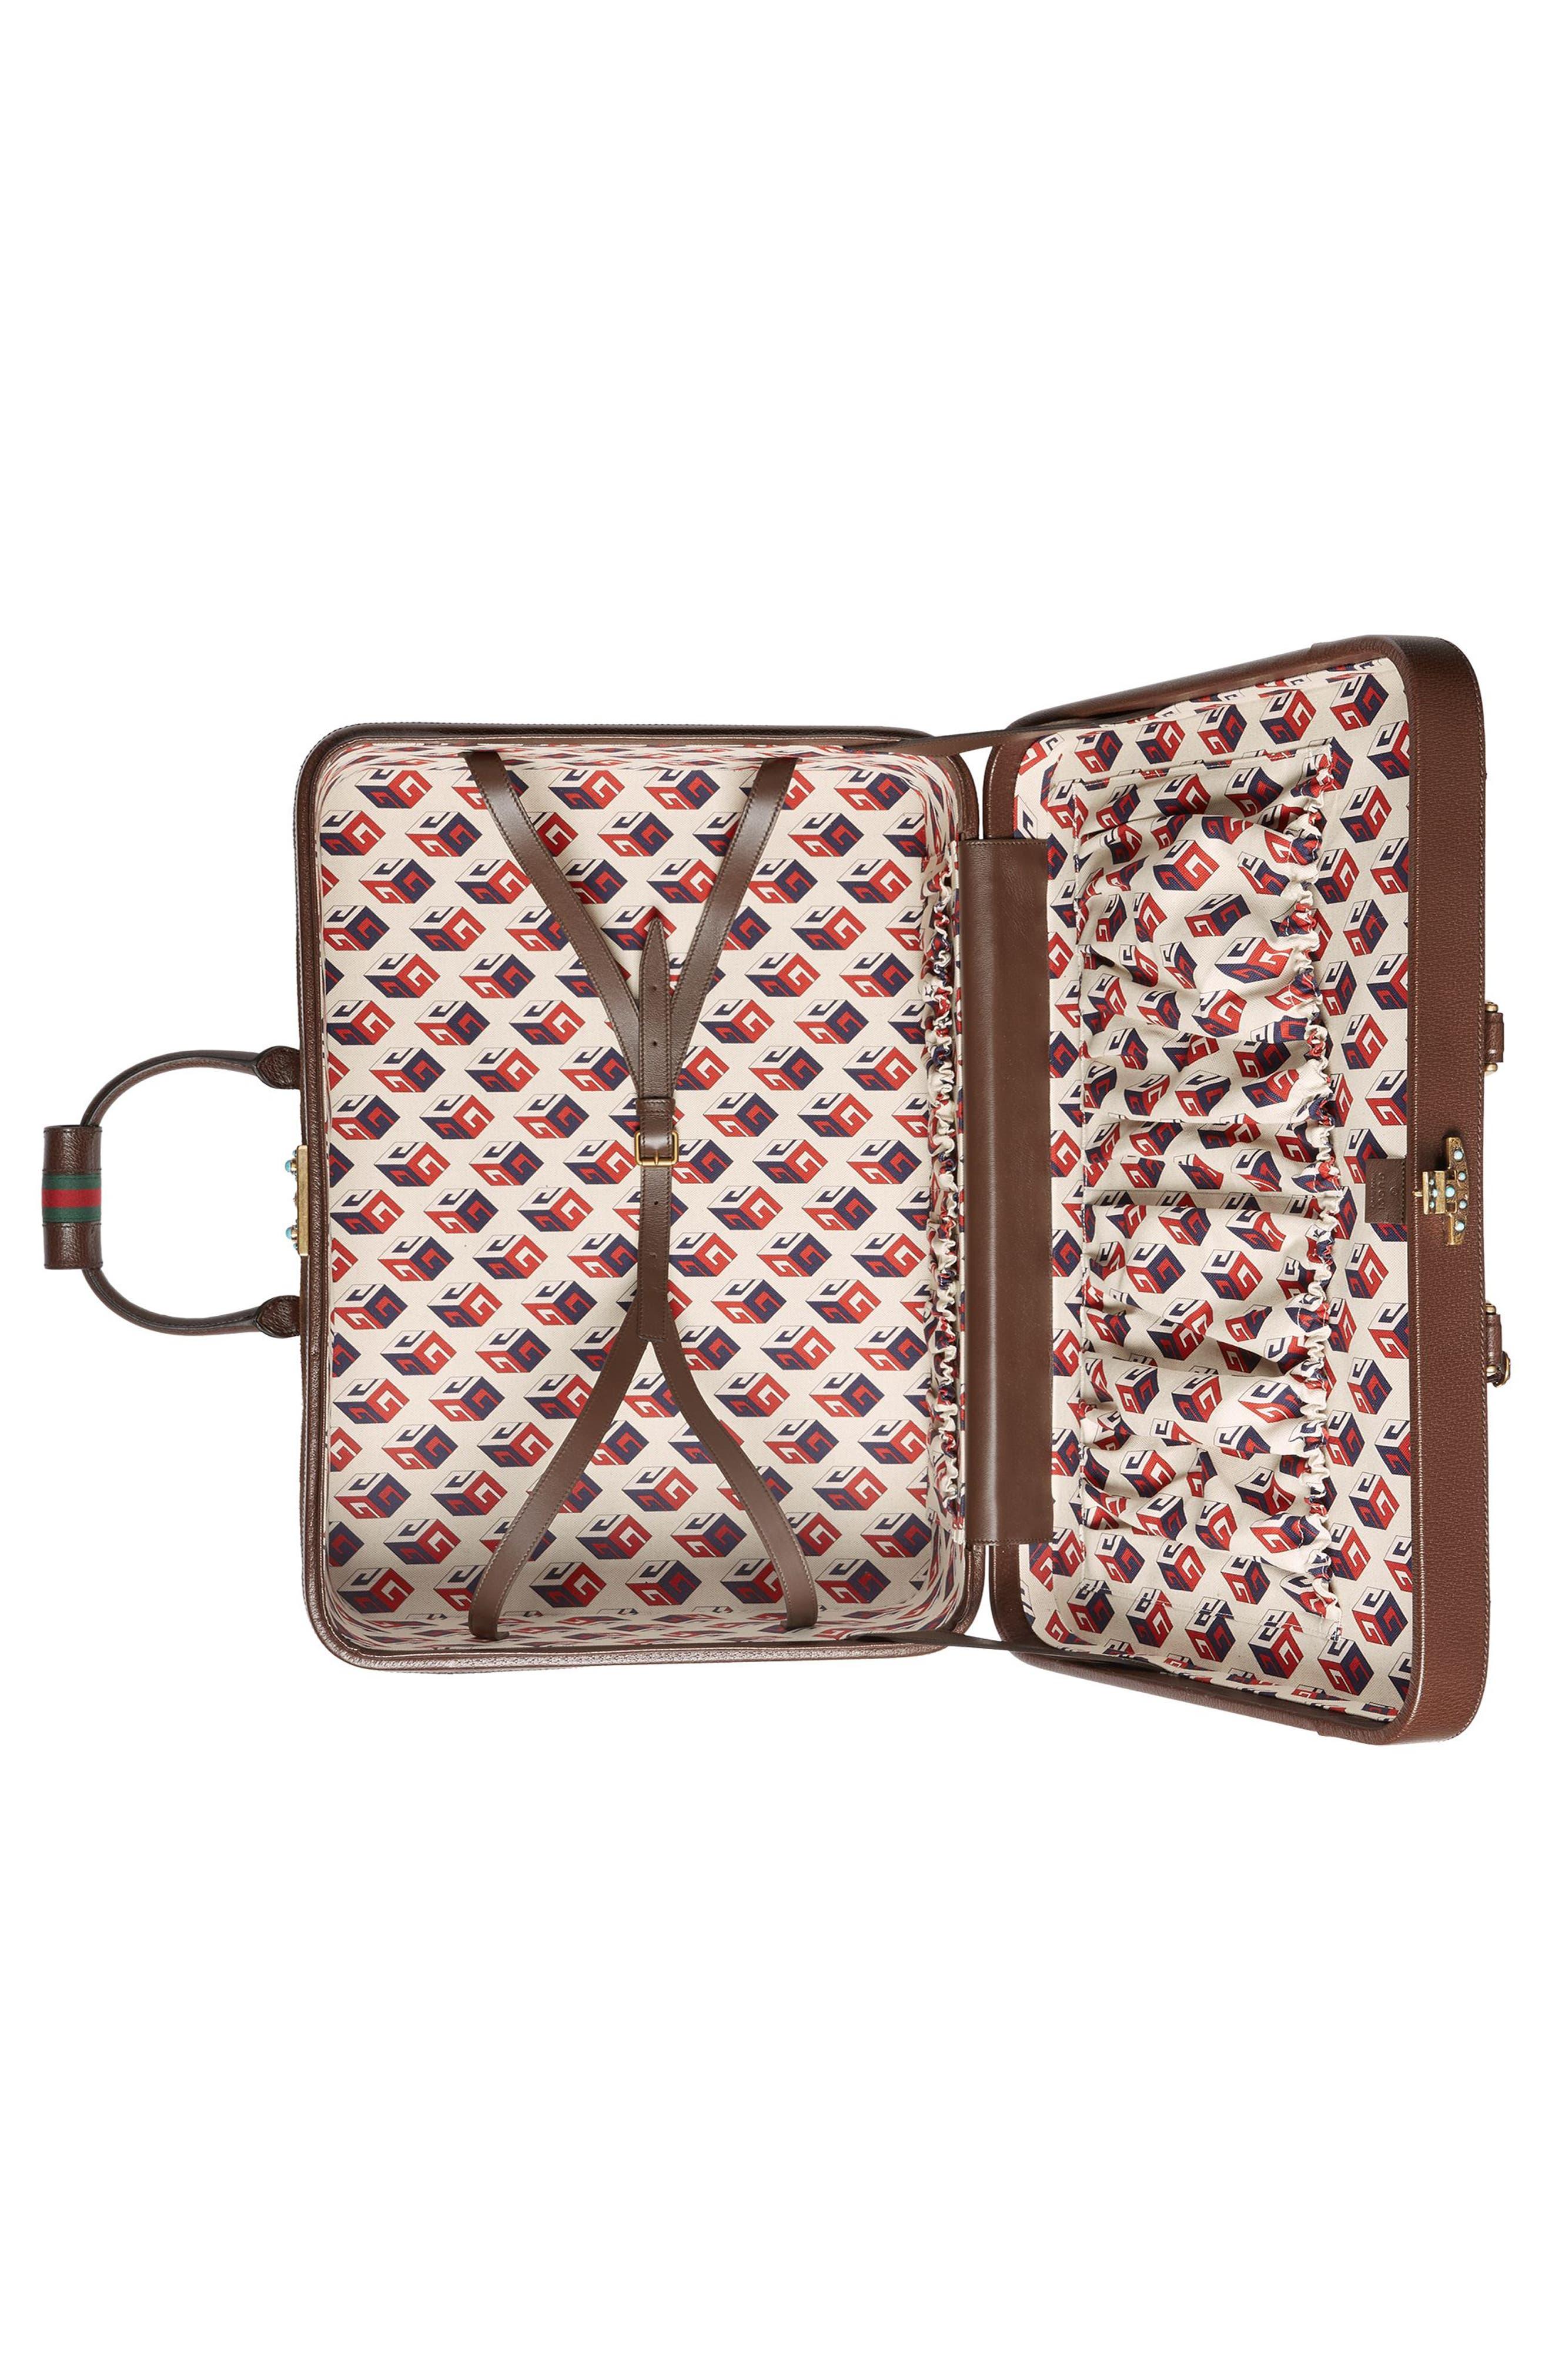 Large Echo GG Supreme Canvas & Leather Suitcase,                             Alternate thumbnail 2, color,                             Beige/ Ebony